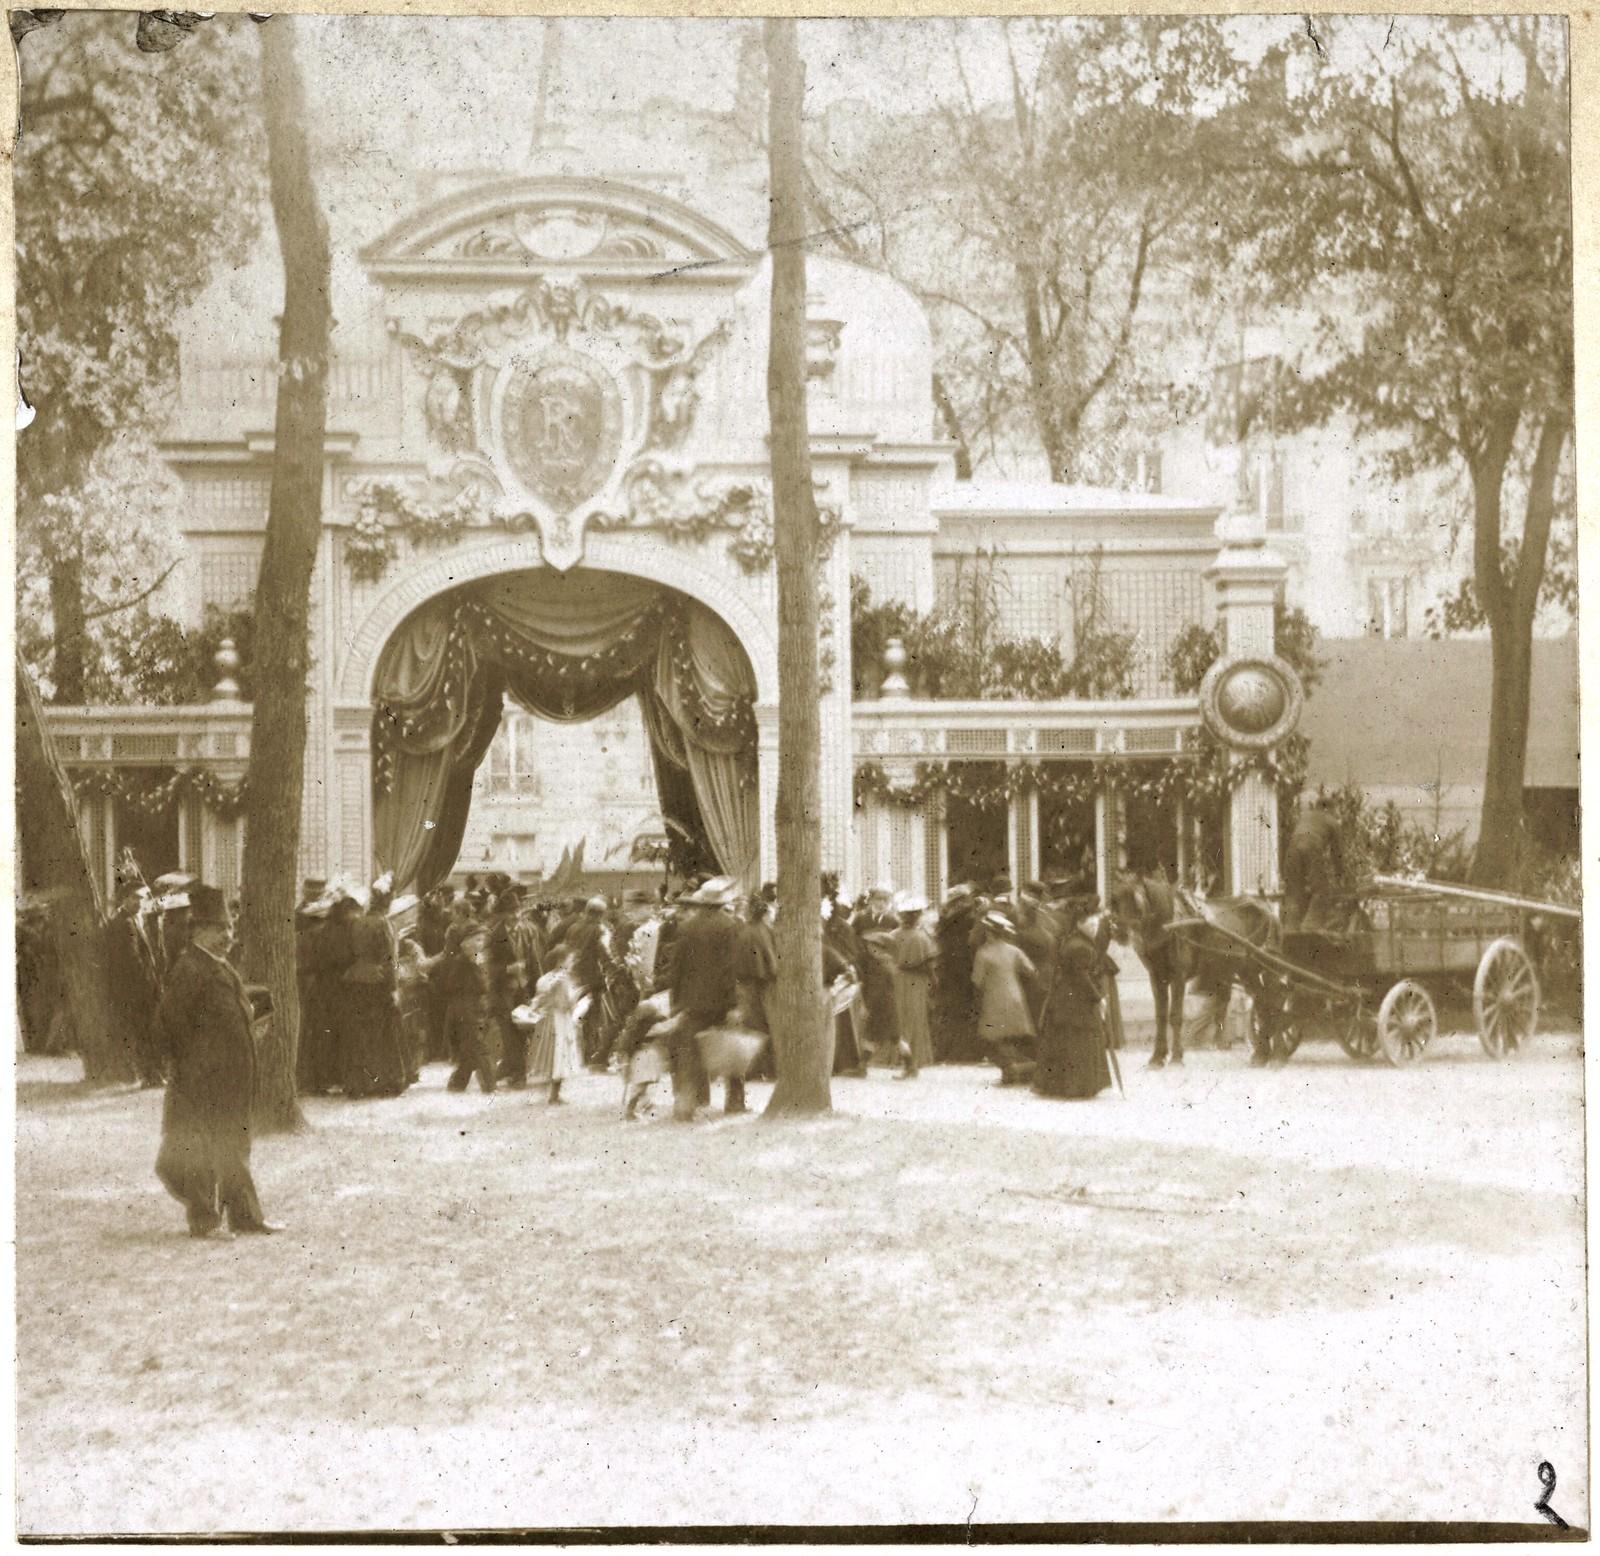 10. Porte Monumentale